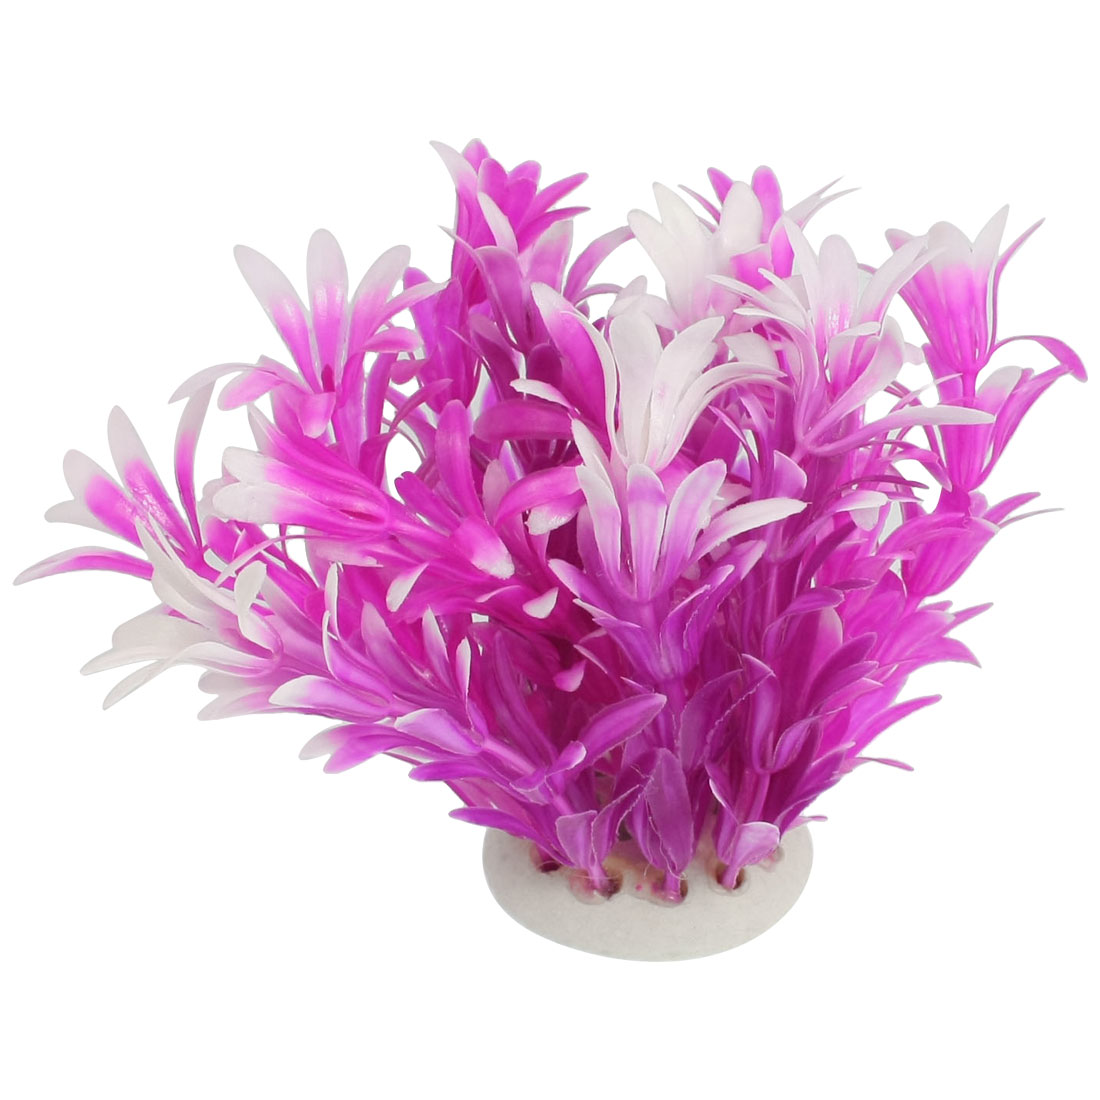 "Ceramic Base Purple Plastic Grass Decoration 4.5"" for Fish Tank"